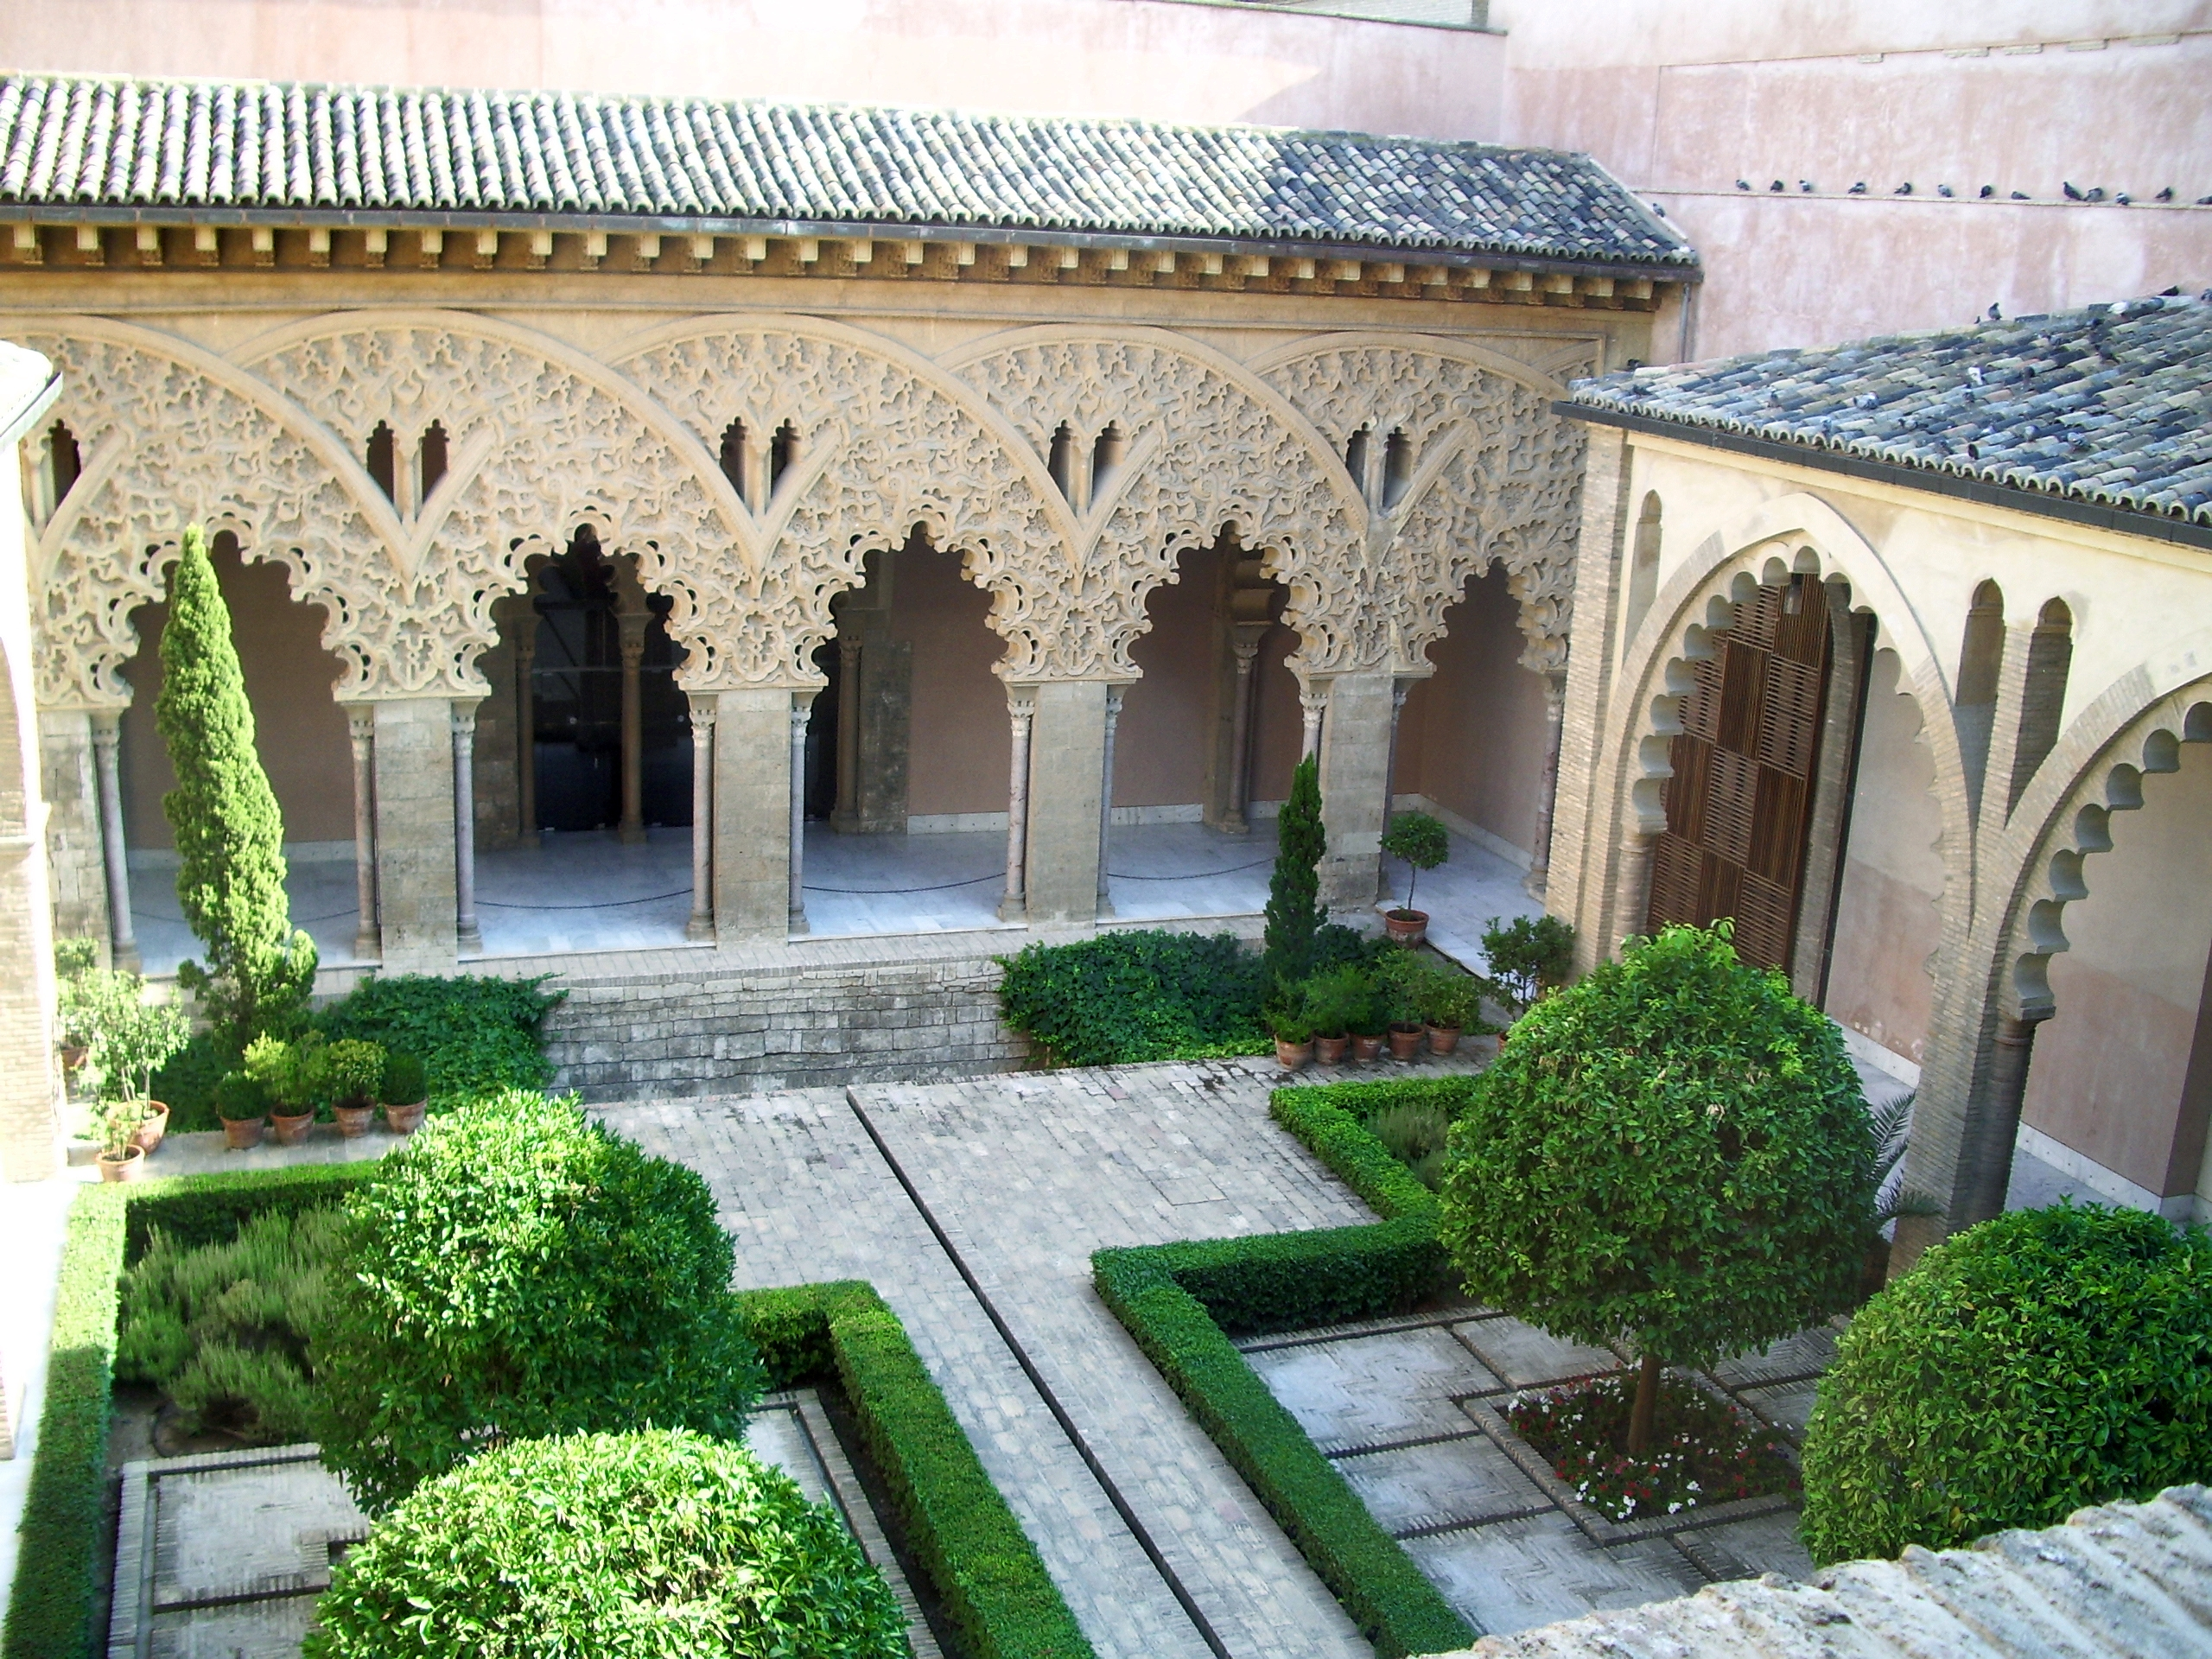 https://upload.wikimedia.org/wikipedia/commons/c/c2/Patio_de_Santa_Isabel.jpg